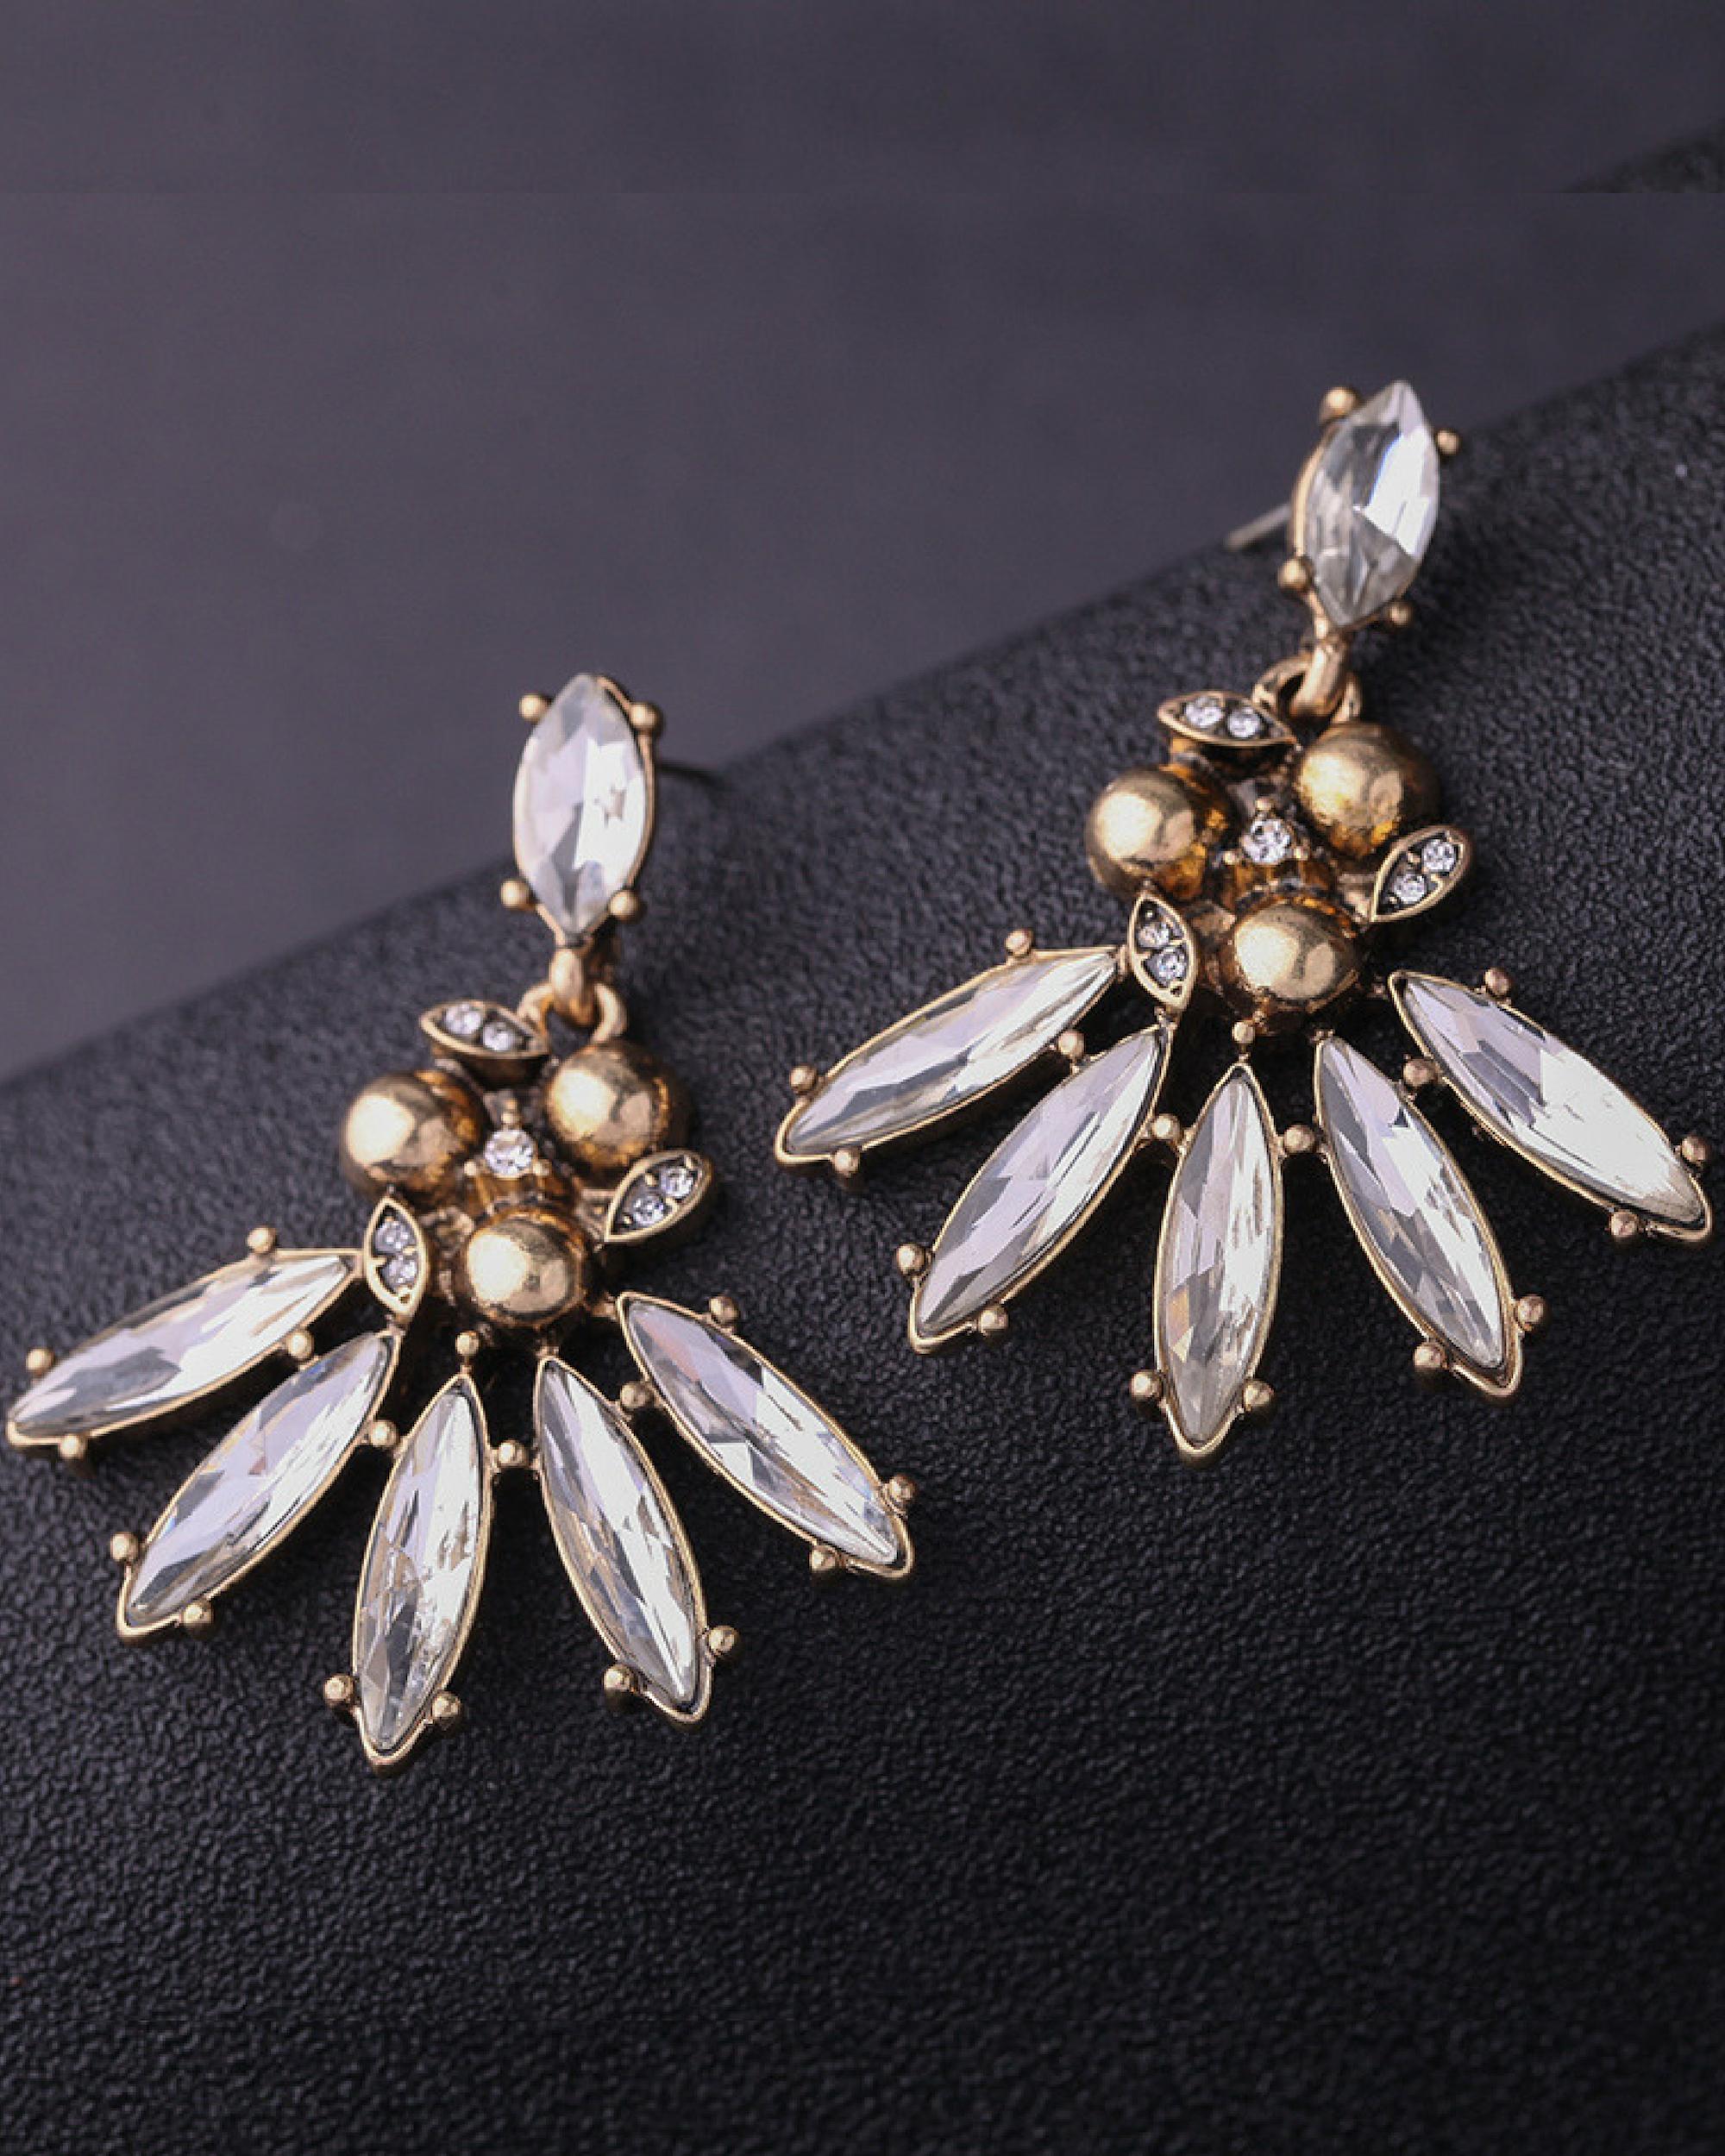 Catchy dangling earrings